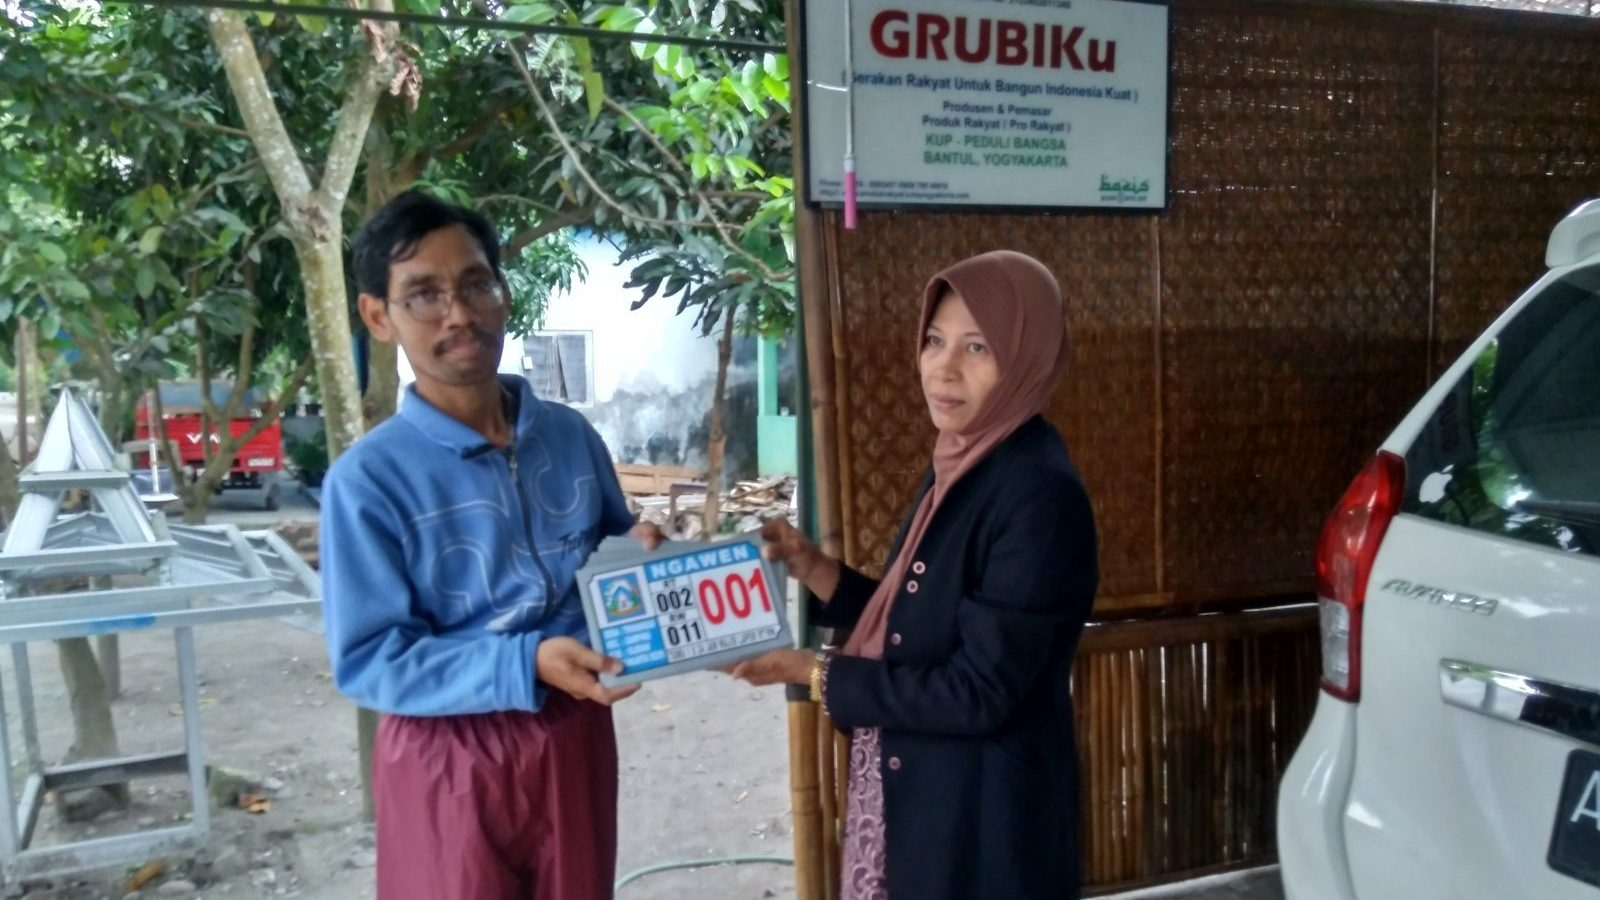 LAYANAN JASA CETAK NOMOR RUMAH TERMURAH DI Jayapura Papua Papua